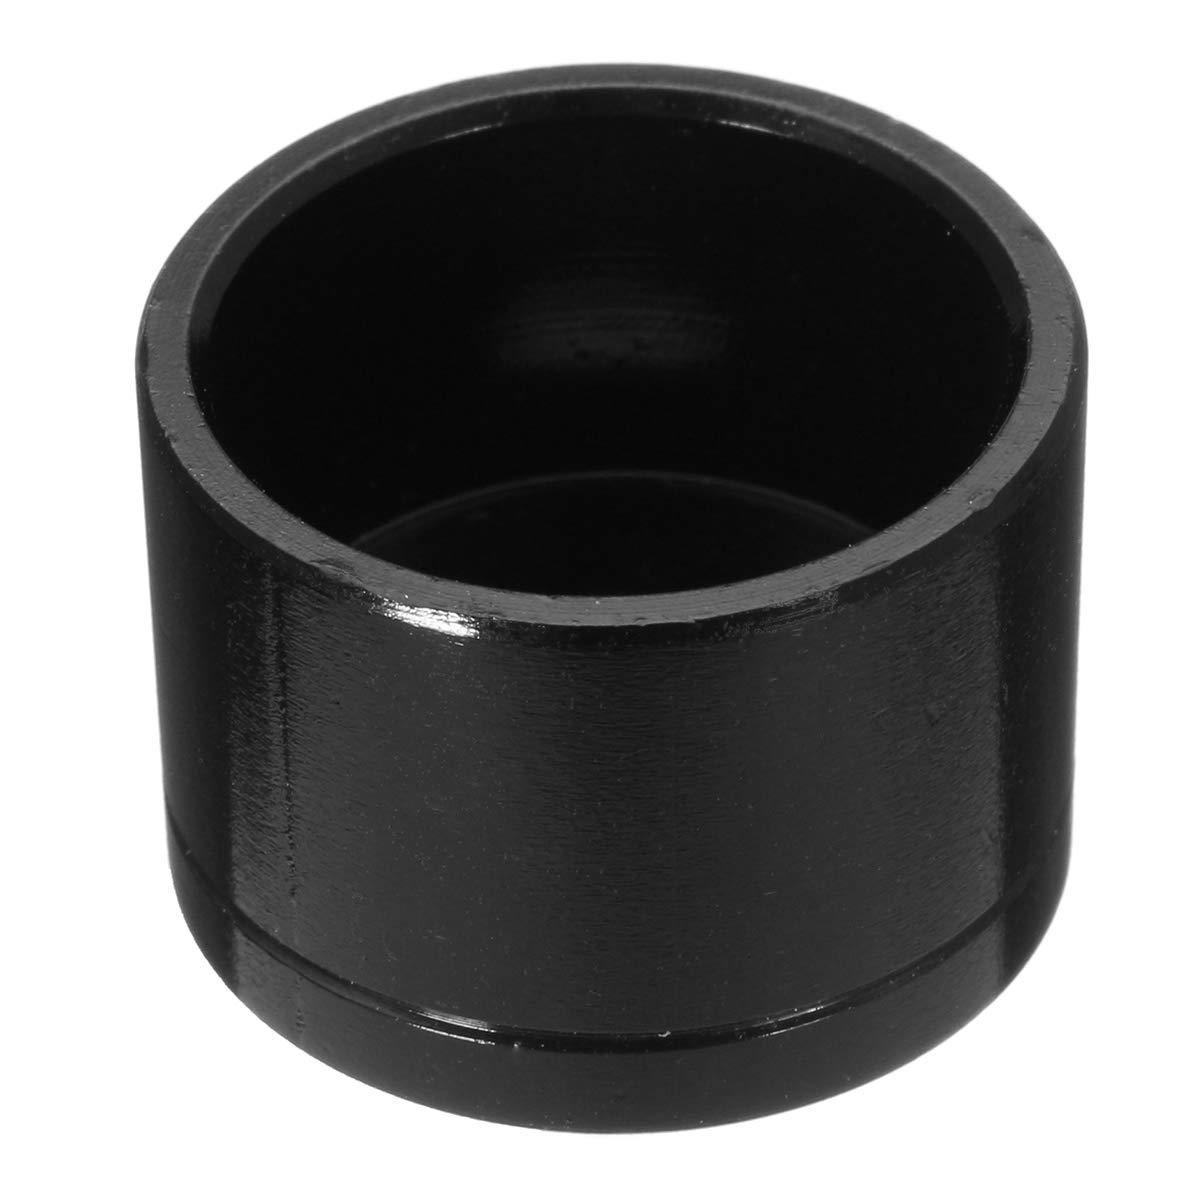 YONGYAO M10x1.25 Black Lift-Up Reverse Lockout Shift Knob Adapter For Manual Shifters